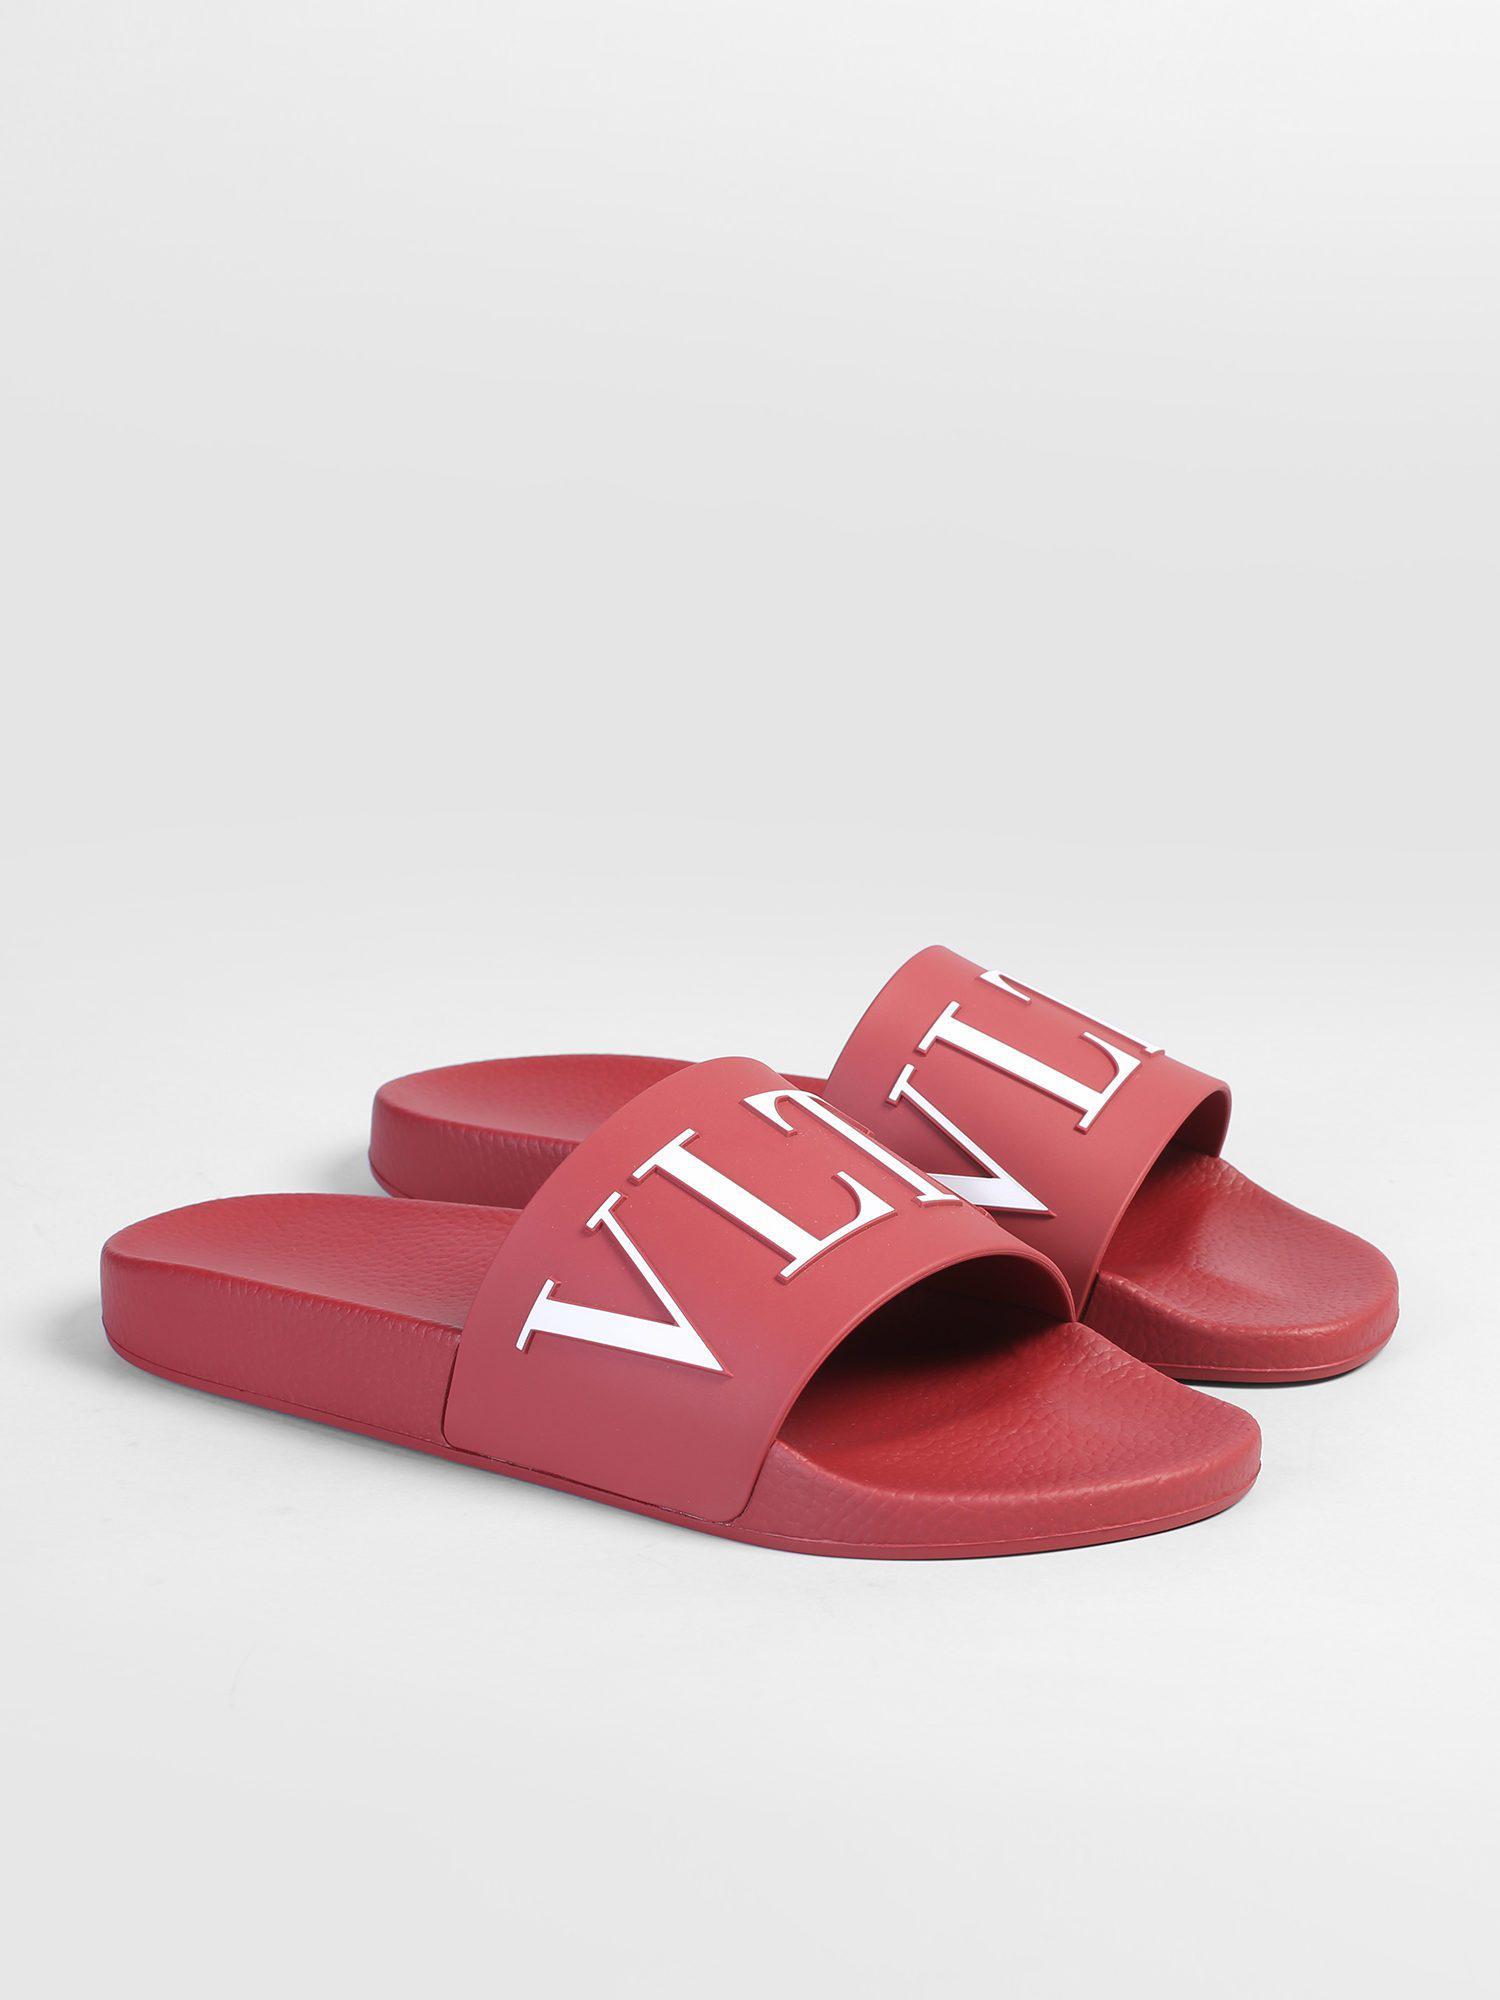 7744077aee68e2 Valentino - Multicolor Rubber Slide Sandals for Men - Lyst. View fullscreen